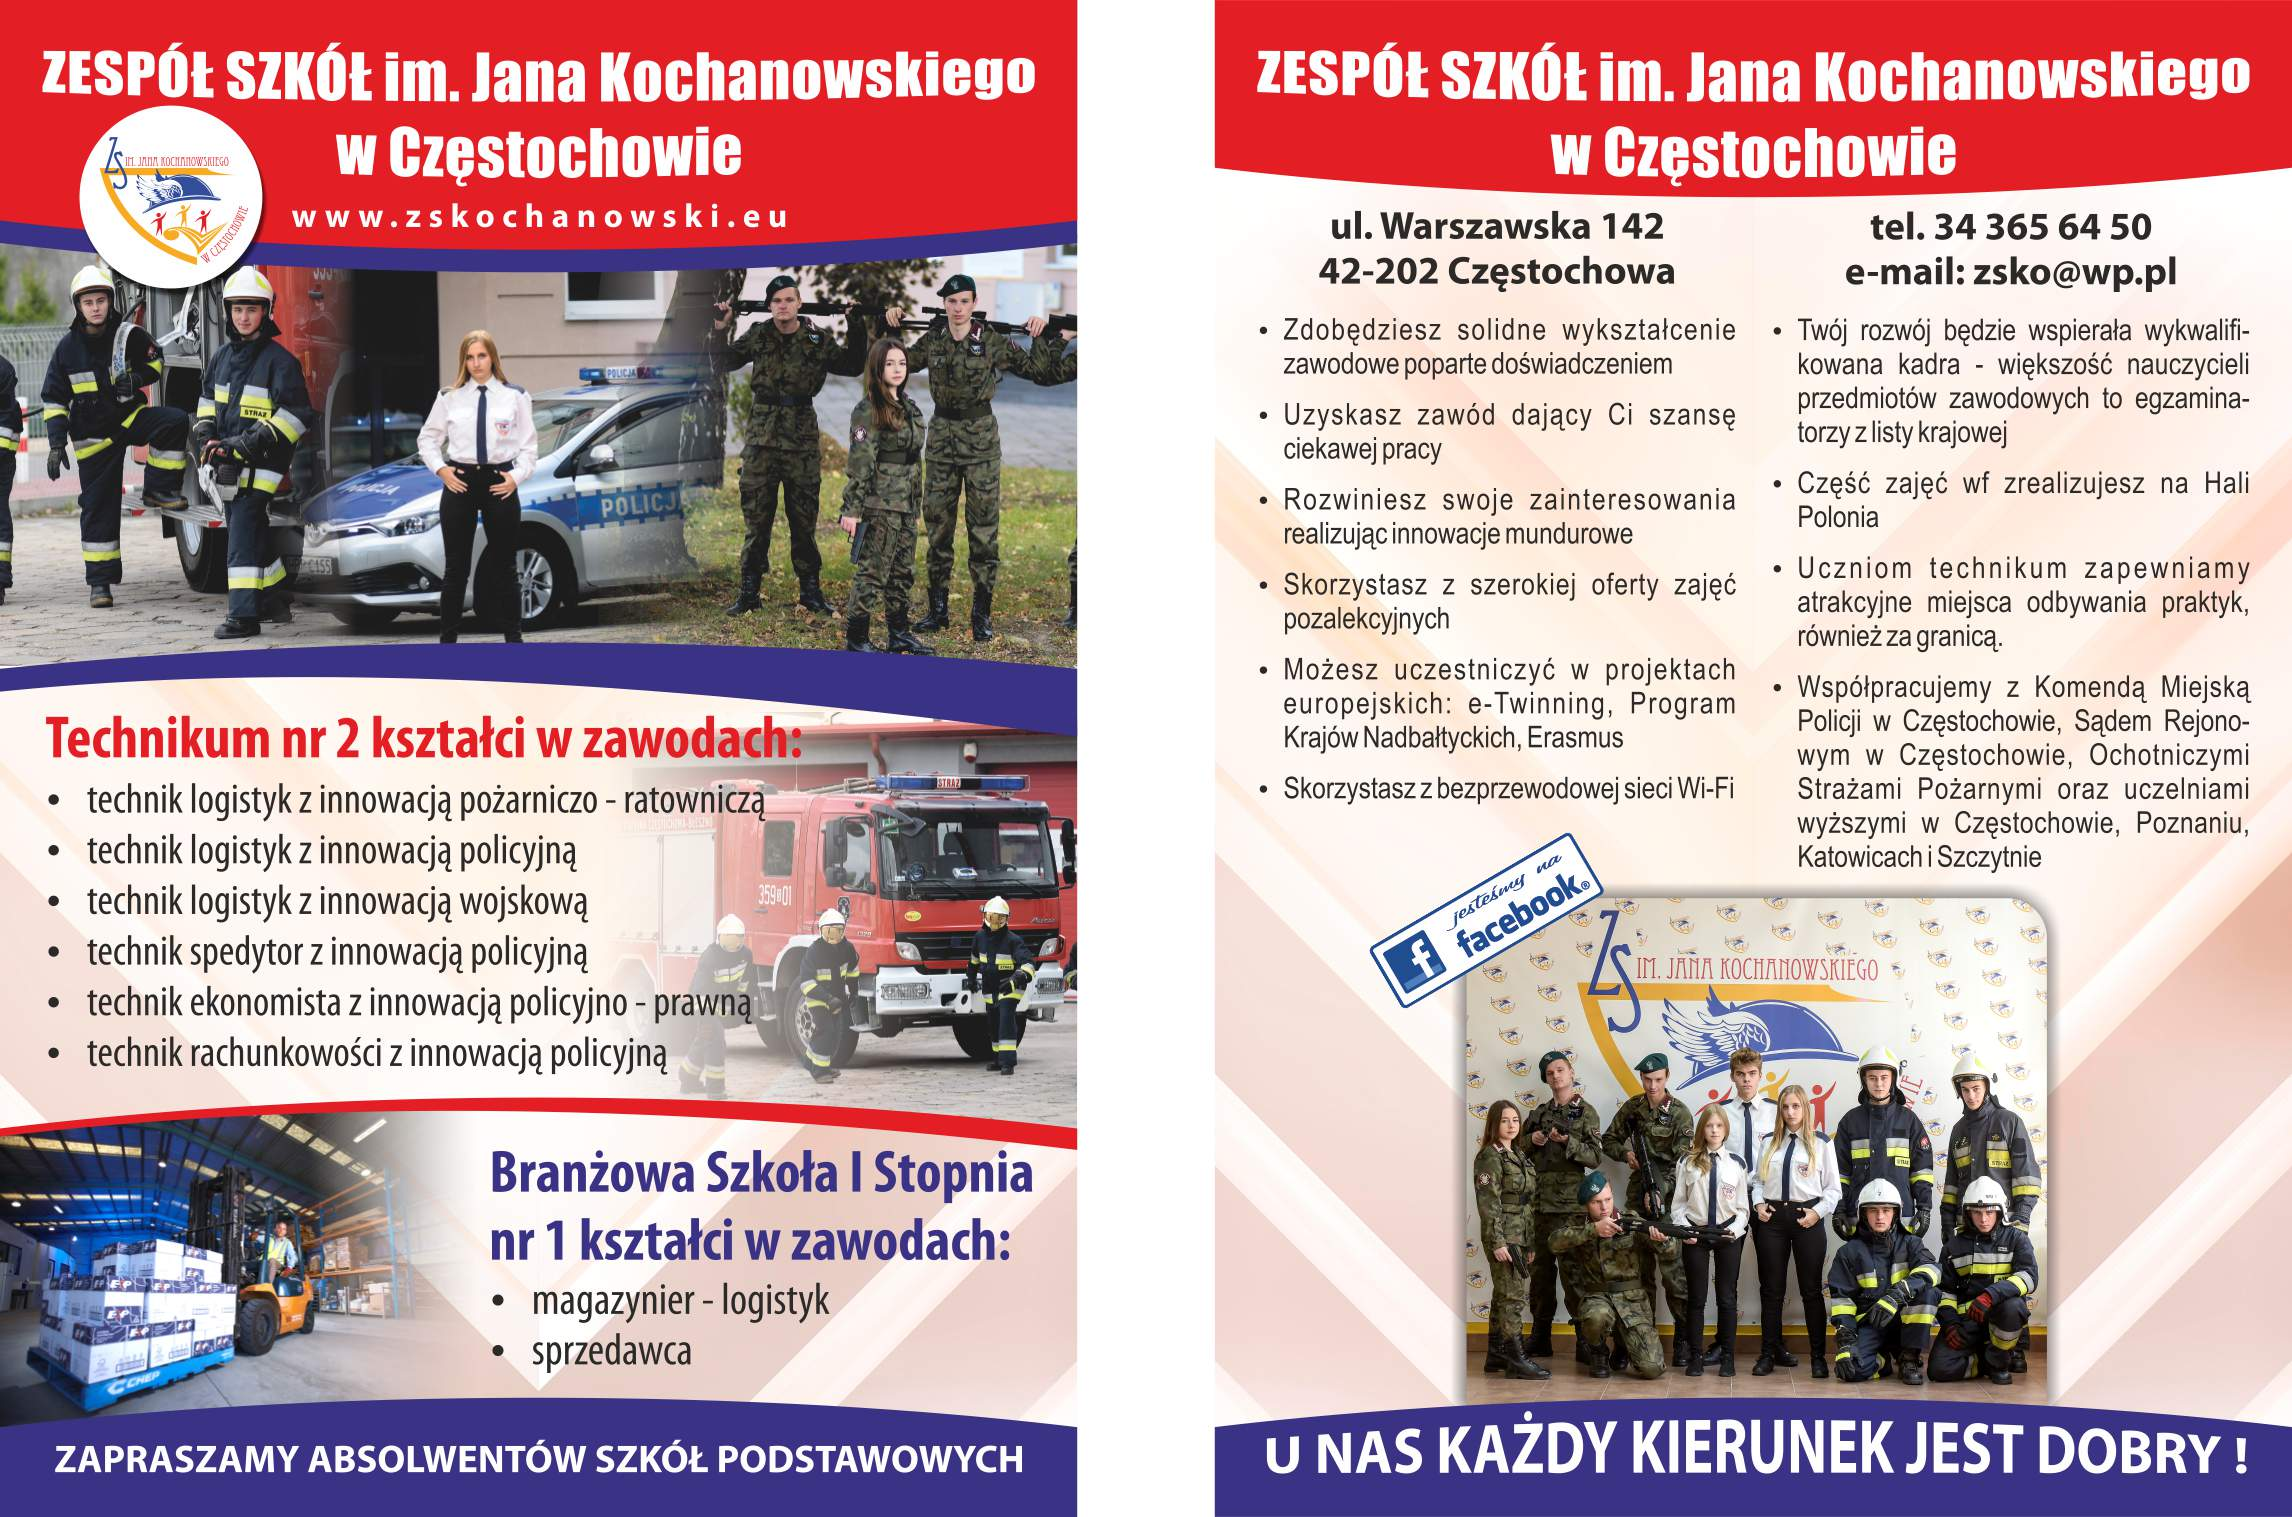 ZS_Kochanowski_(1).jpg